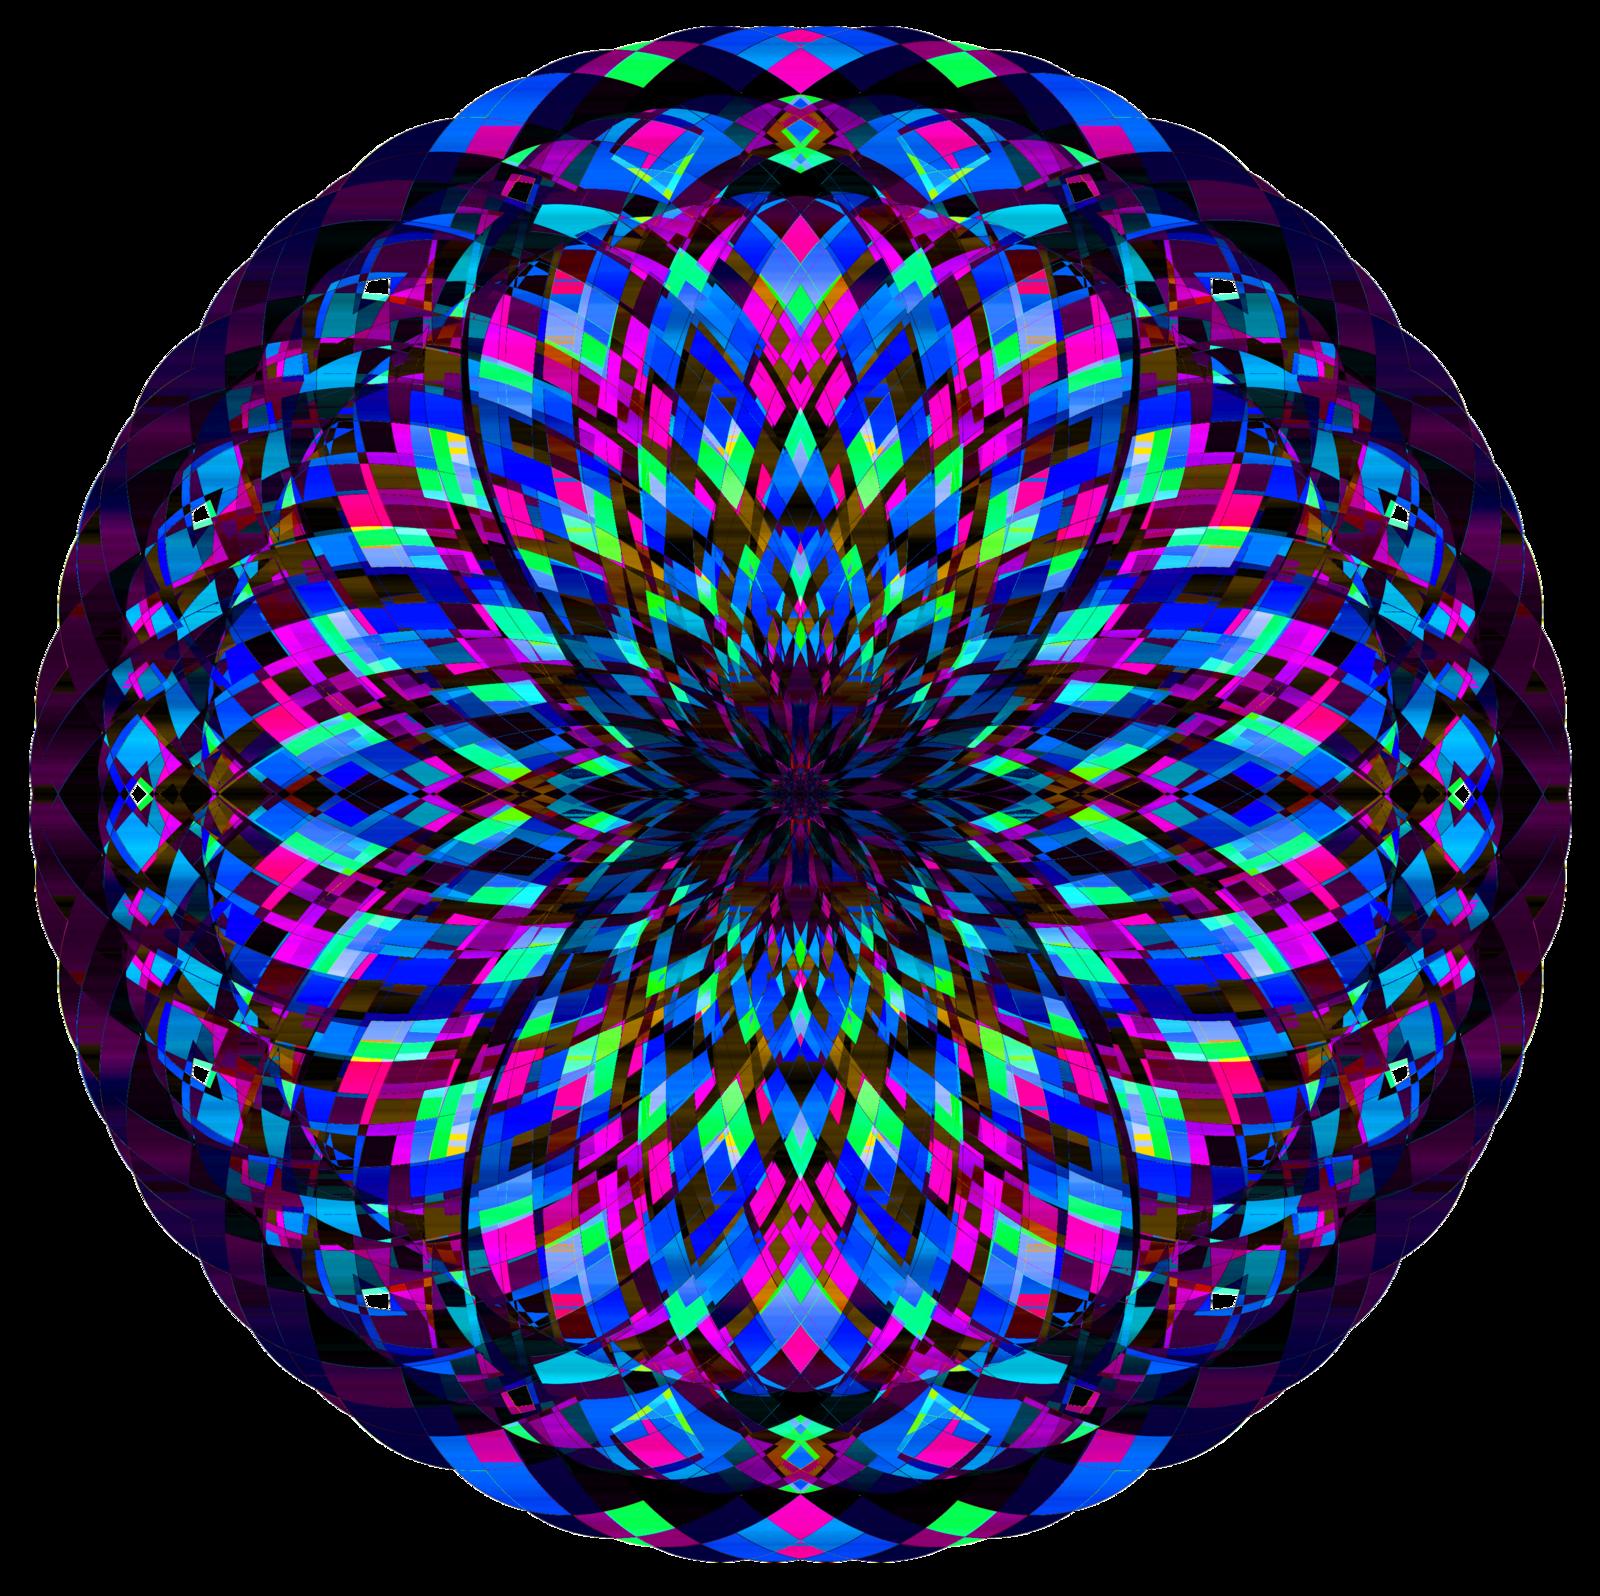 Kaleidoscope PNG Image.